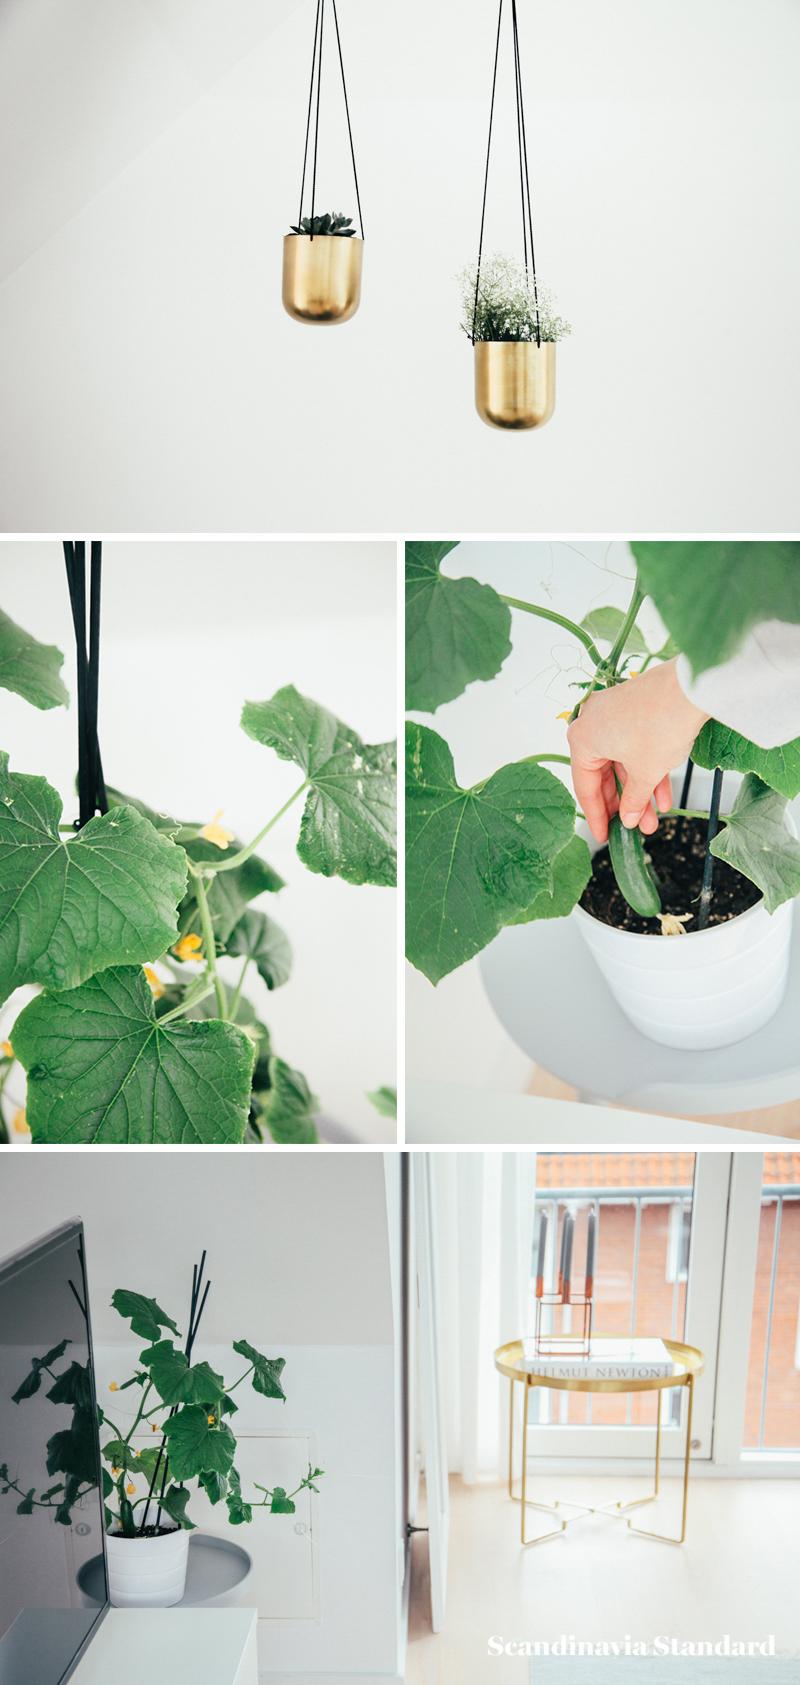 The White Room - Christina & Ulrich's Østerbro Apartment - Interiors - Collage 6 | Scandinavia Standard